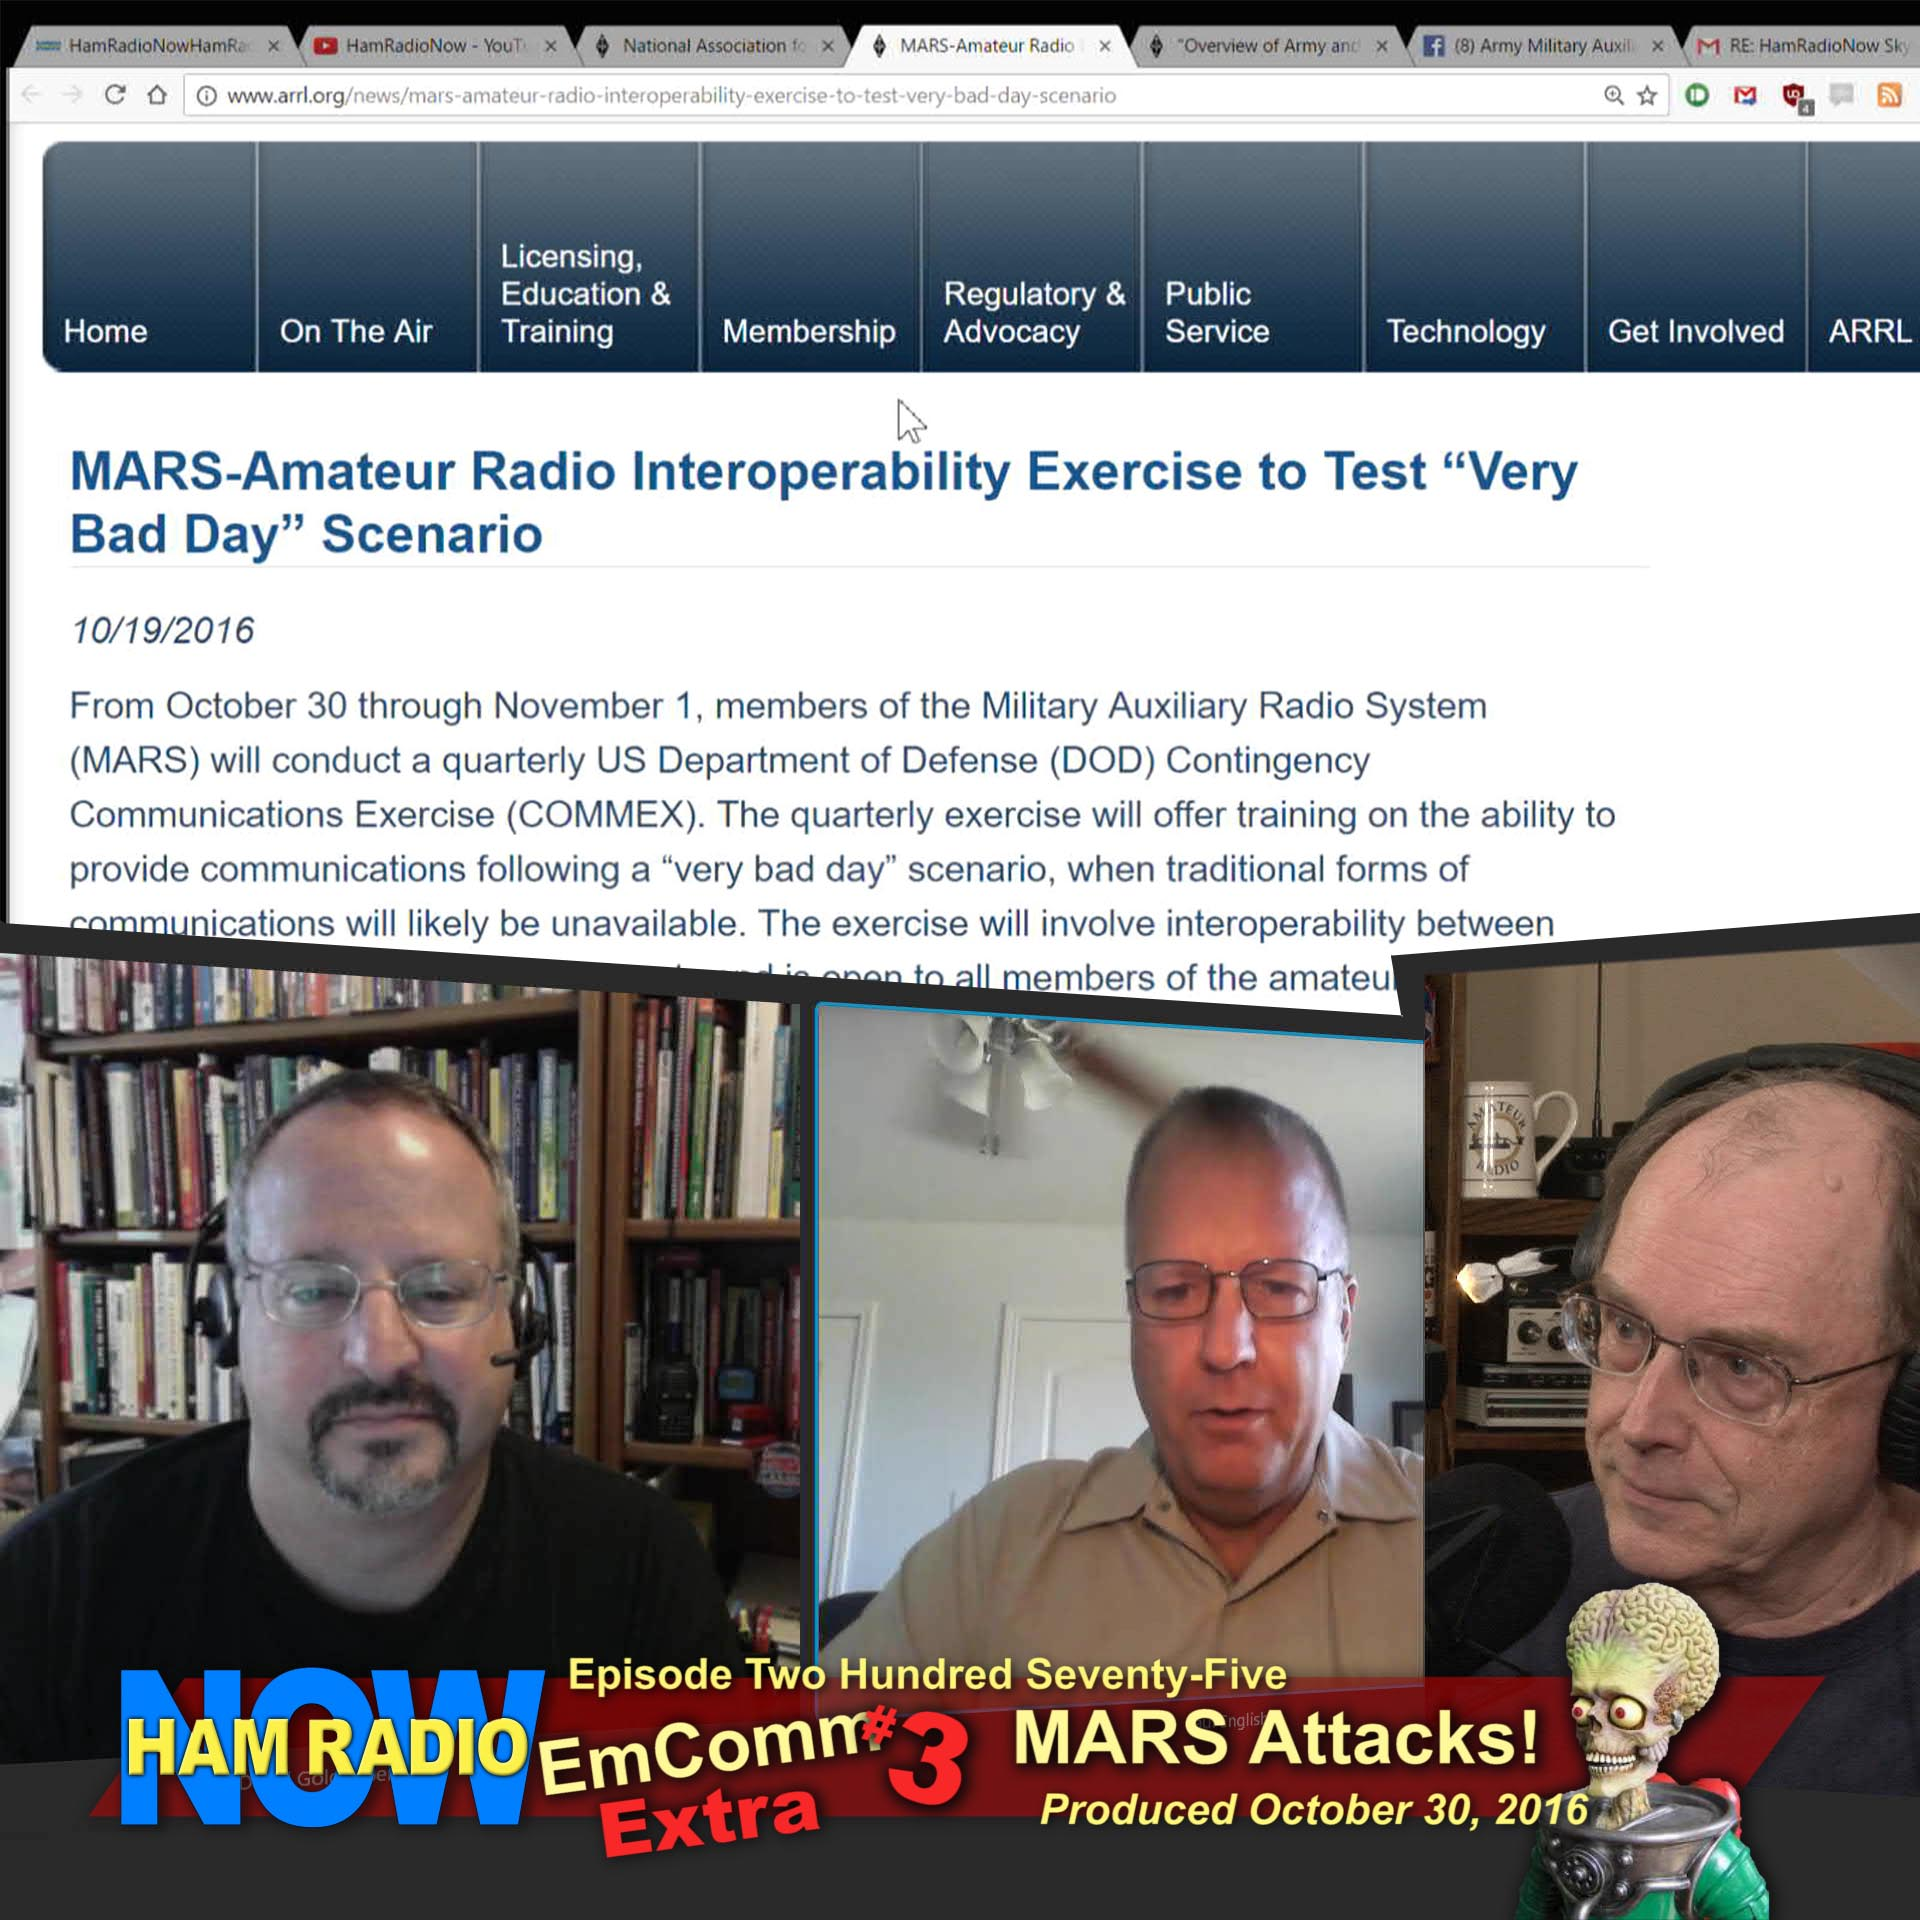 HRN 275: EmComm Extra #3 - MARS ATTACKS! (Interop test, on HamRadioNow)